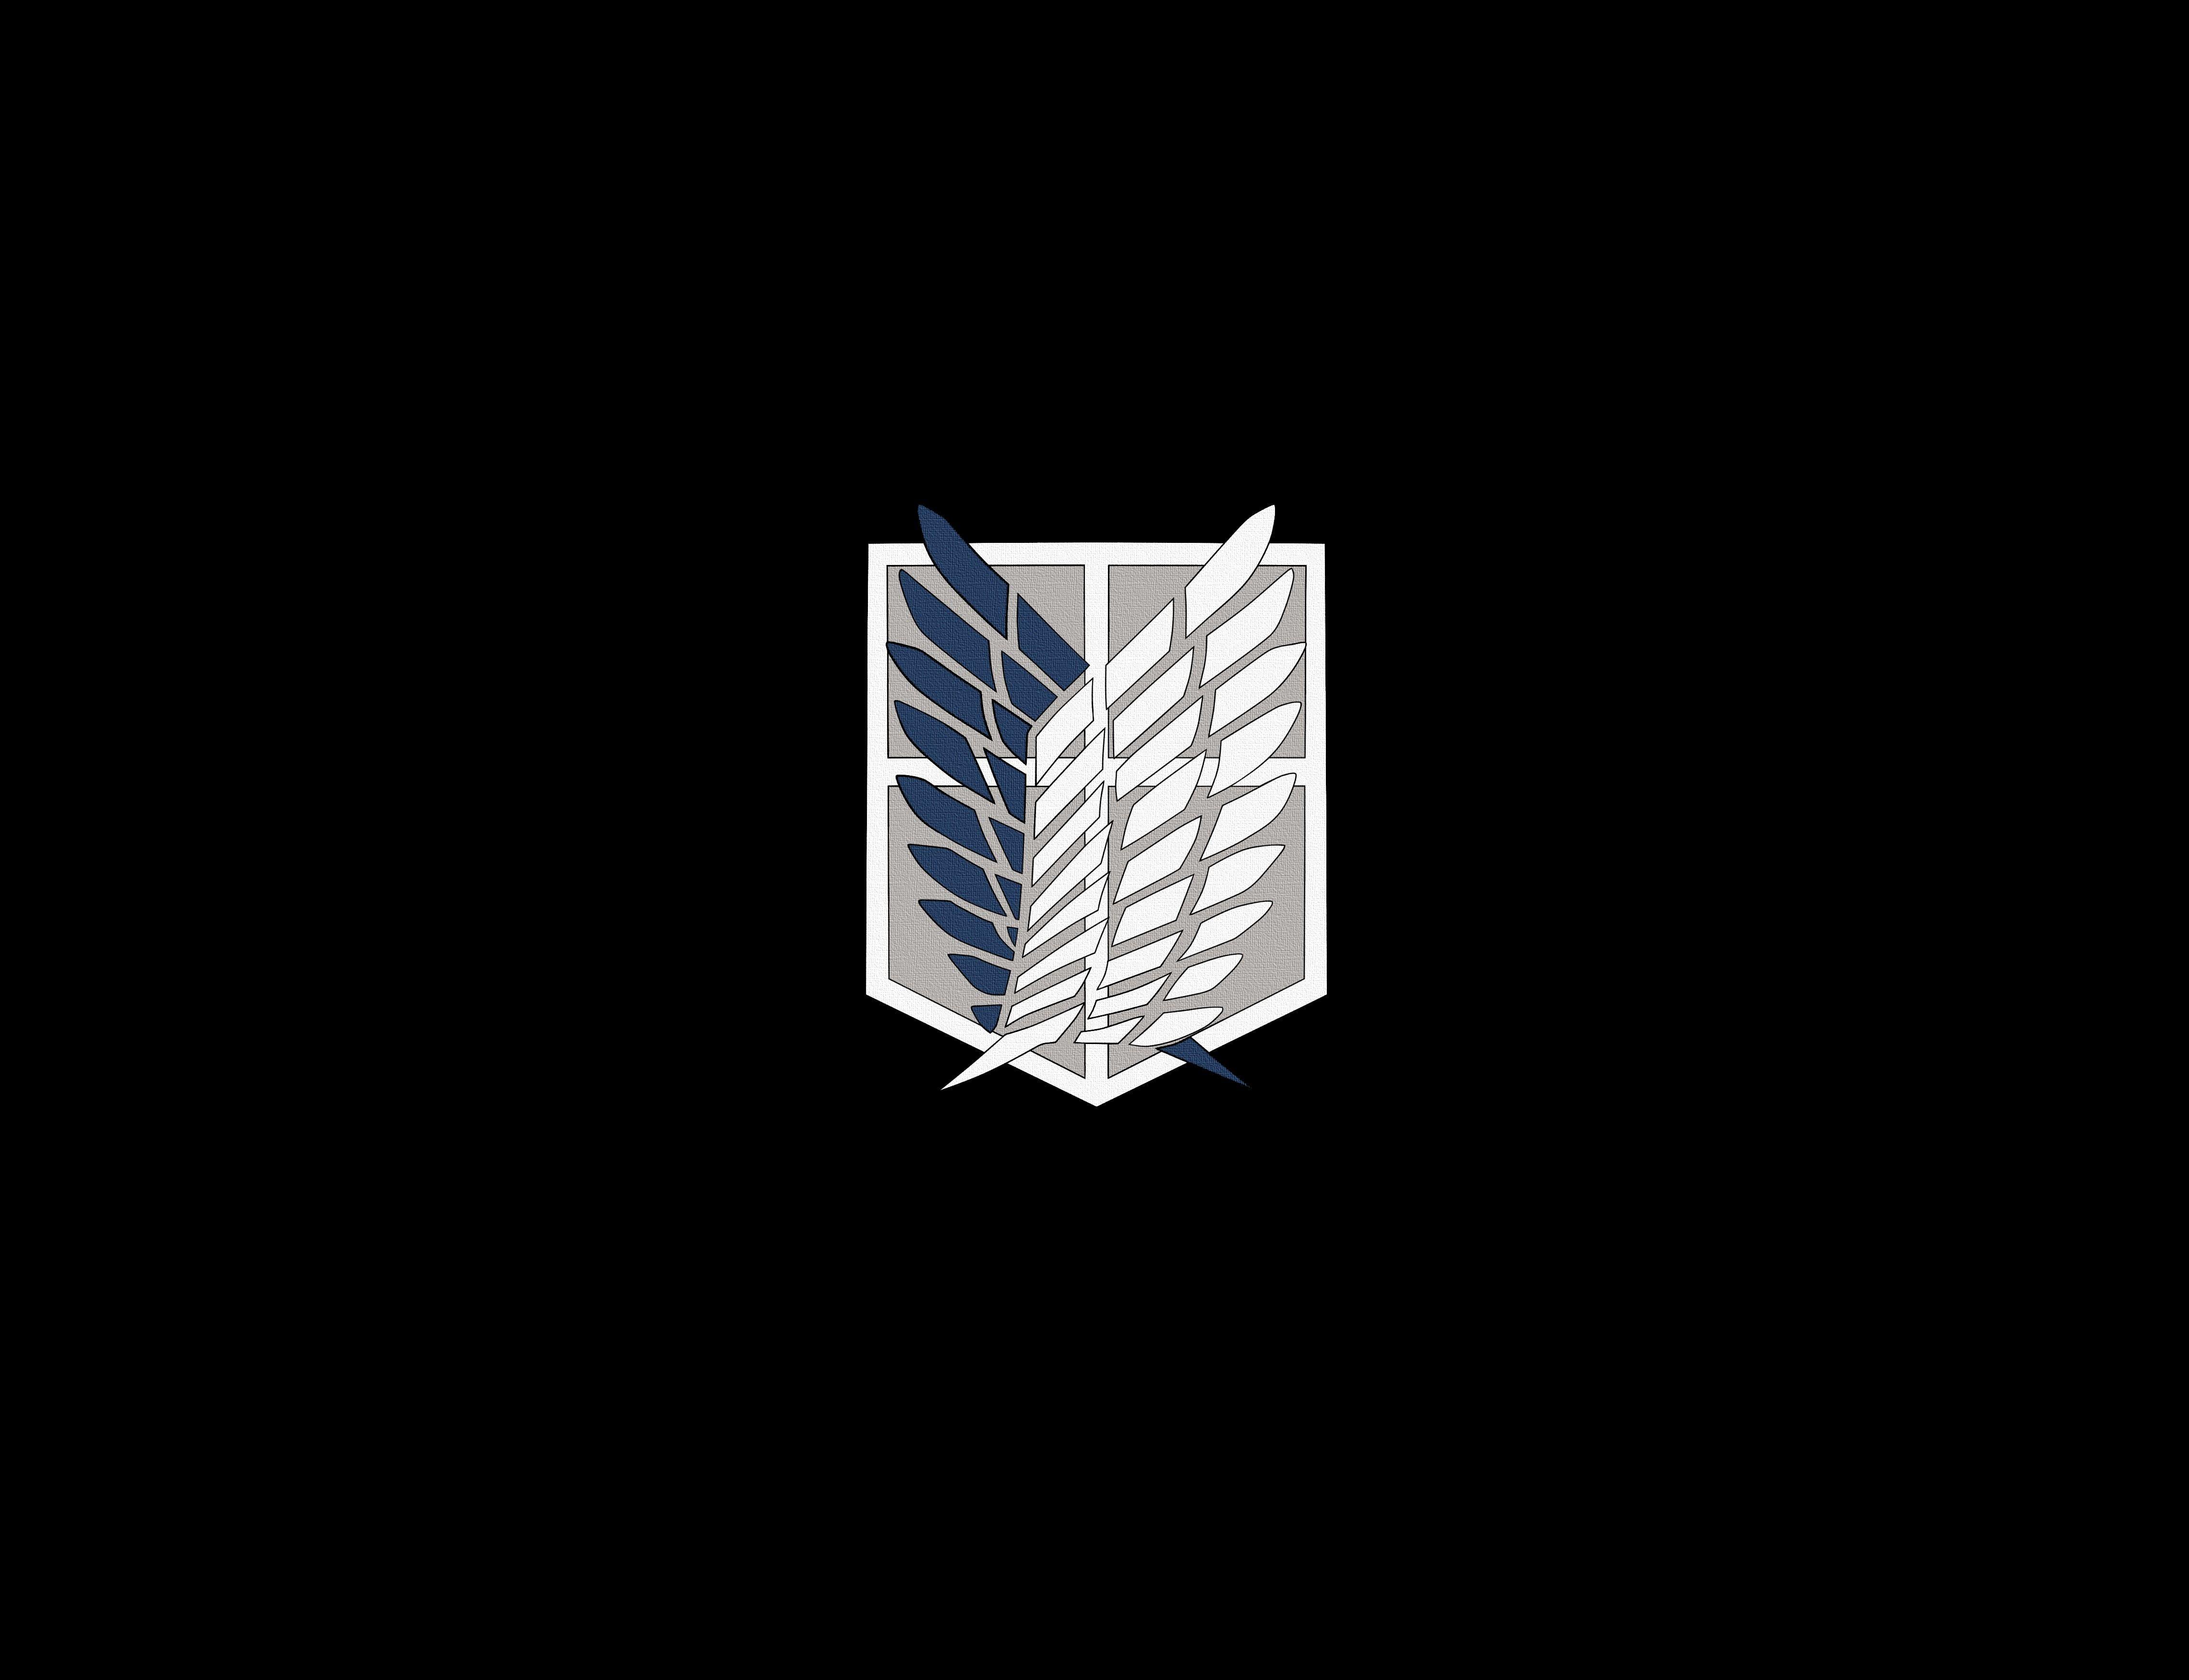 Kawaii wallpaper, levi wallpaper, logo wallpaper, mikasa wallpaper, minimalist. Attack on Titans icon Shingeki no Kyojin #anime # ...